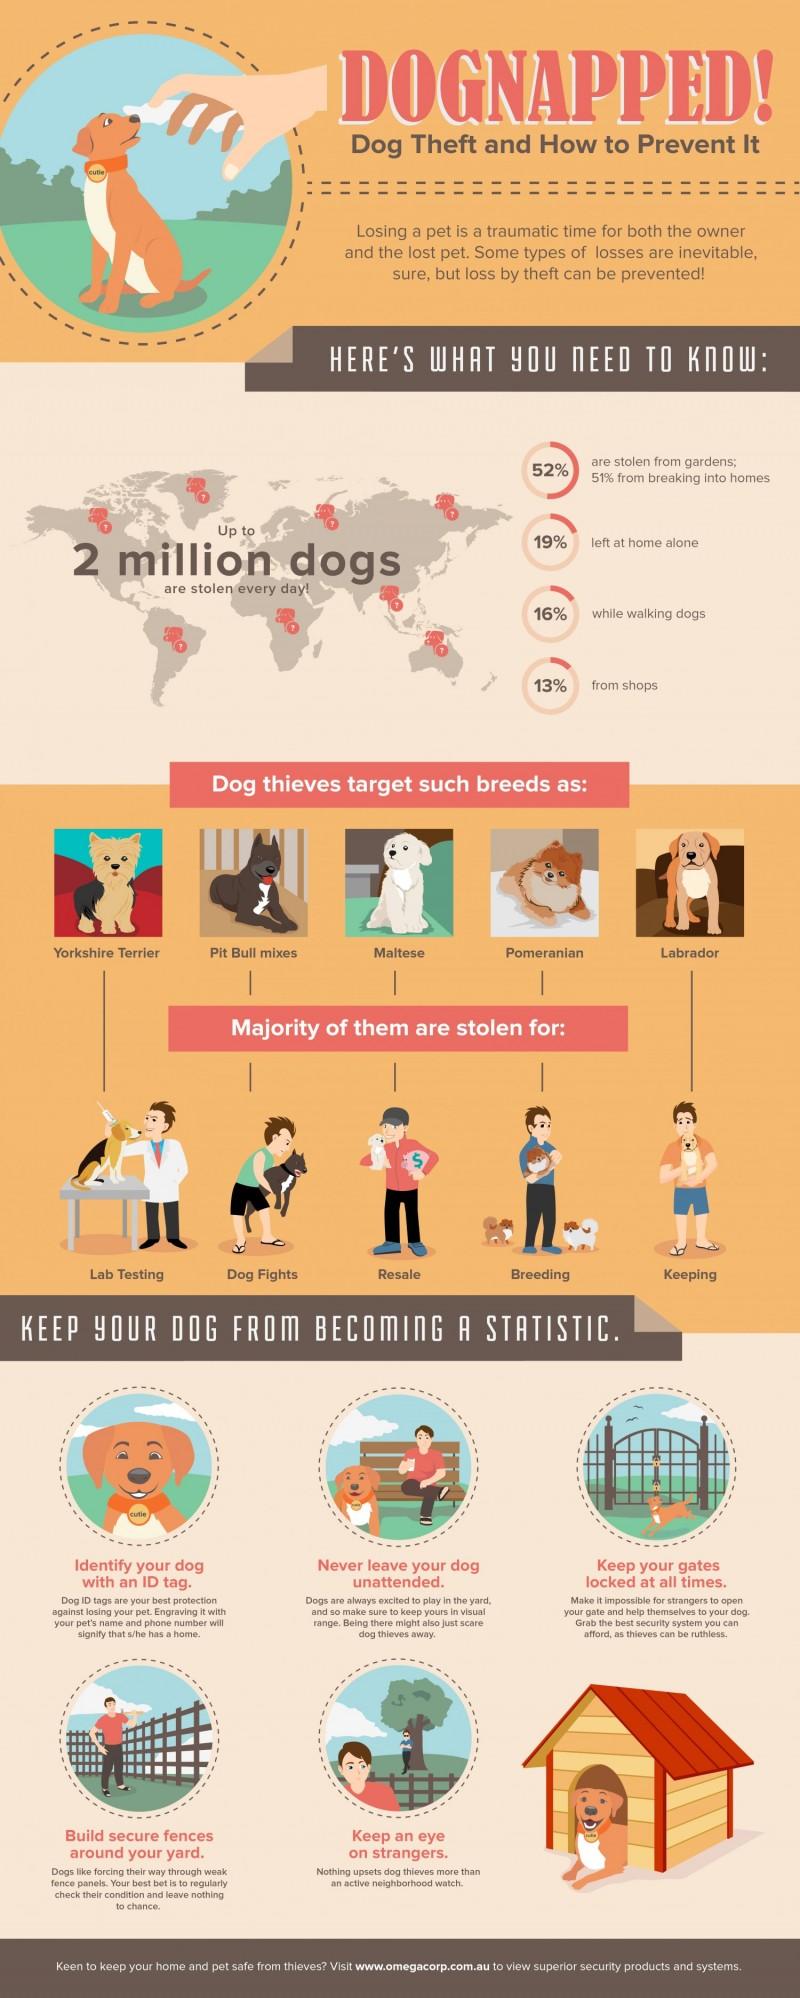 Dog Theft & Dognapping